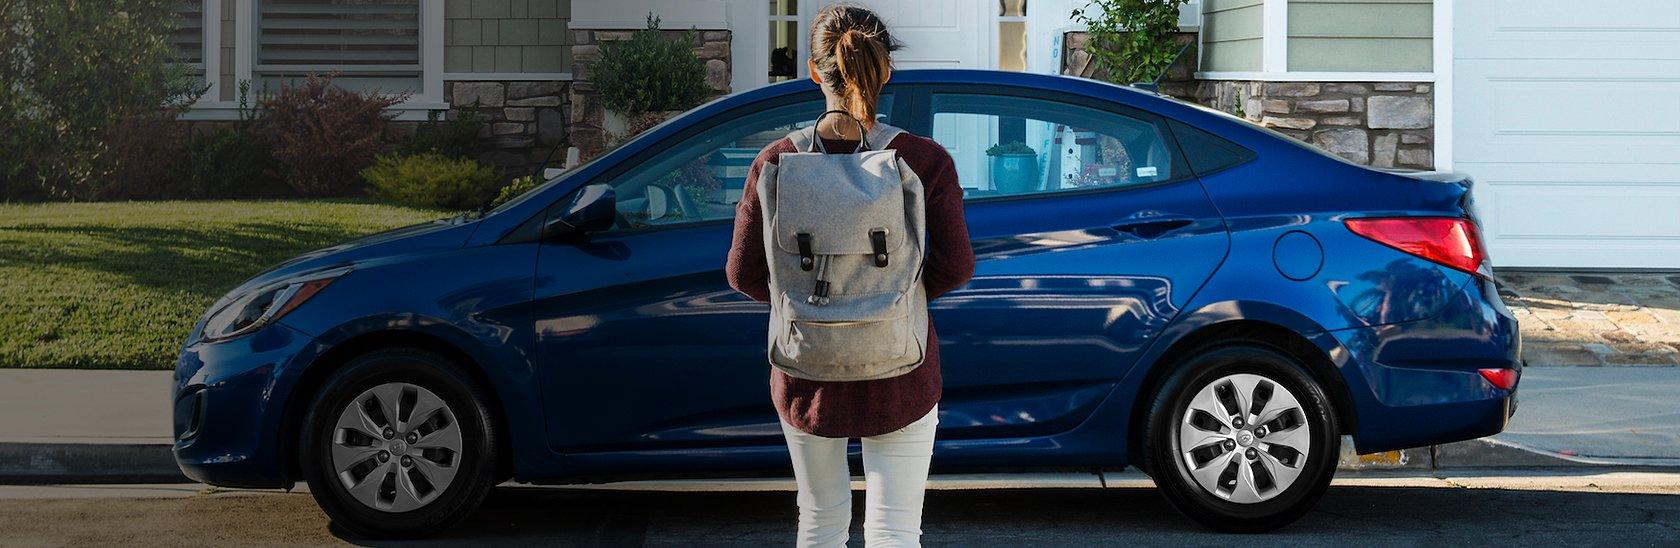 A Student standing next to a Hyundai car